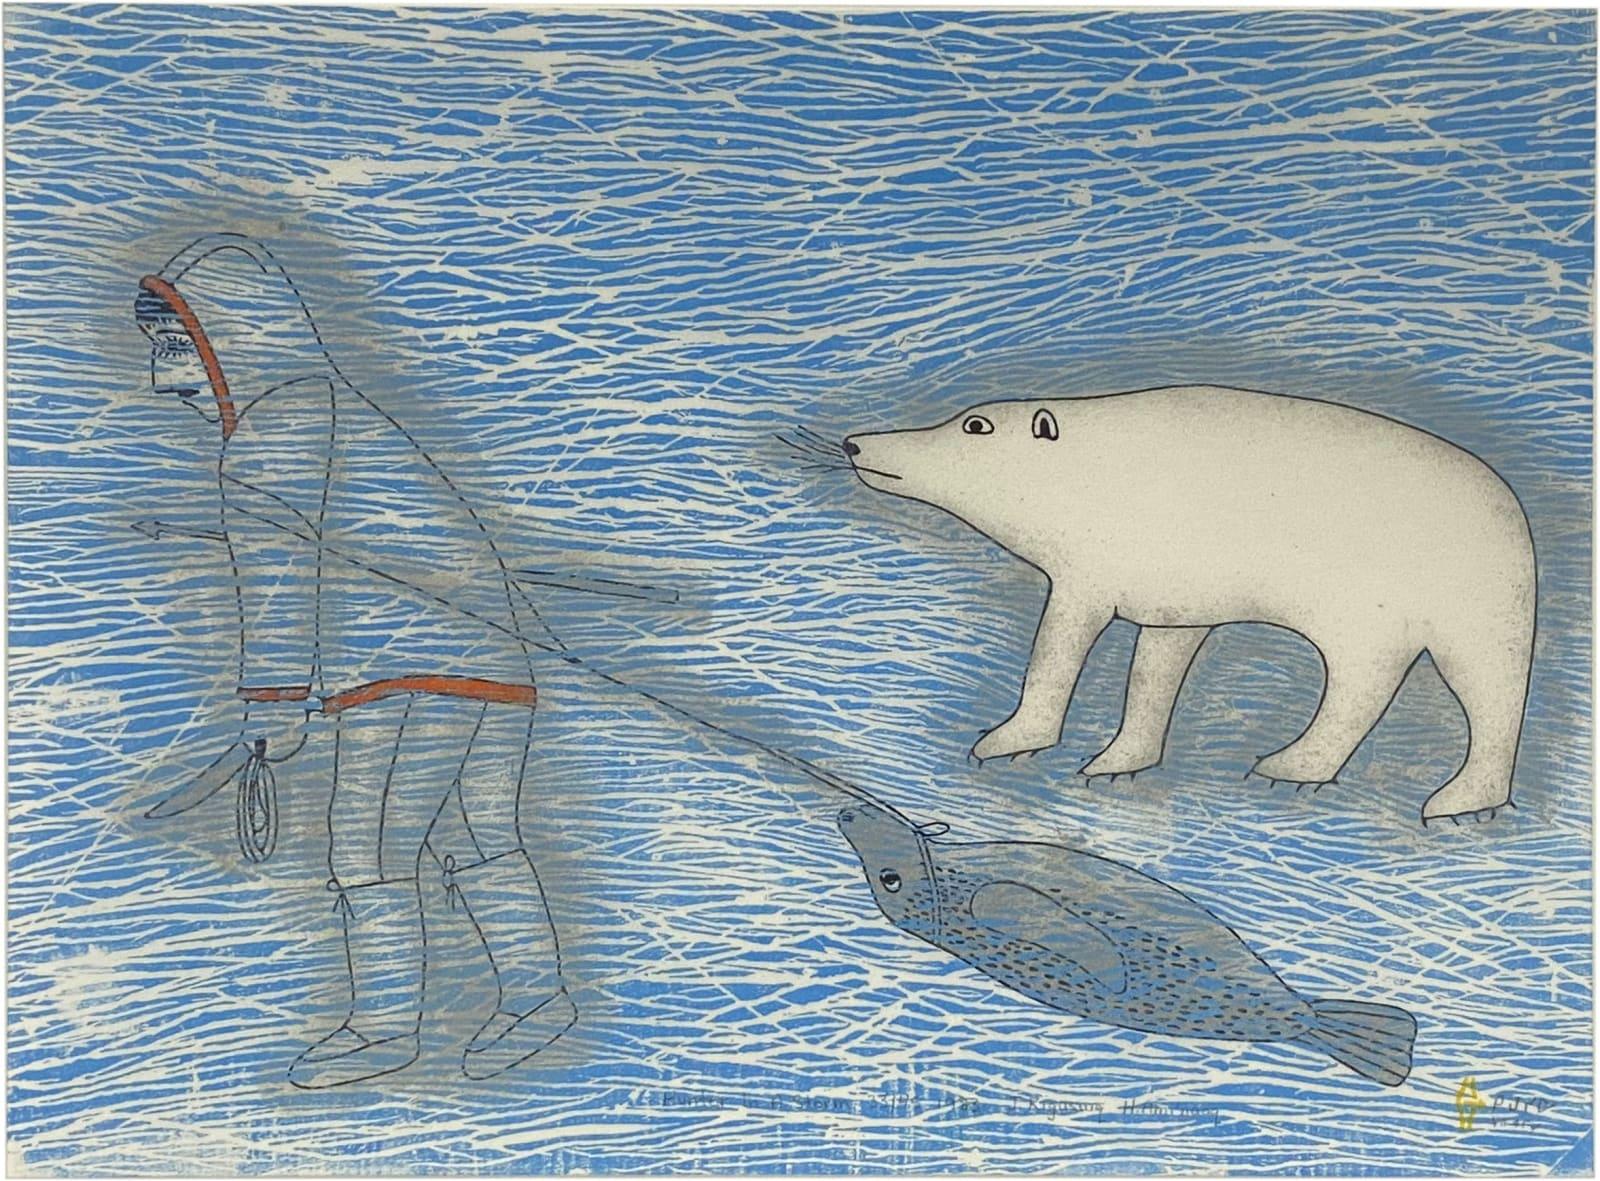 JANET KIGUSIUQ (1926-2005) QAMANI'TUAQ (BAKER LAKE) Hunter in a Storm, (1983/4) , 1996 stonecut and stencil, framed, sight: 16 1/2 x 22 3/4 in (41.9 x 57.8 cm) ESTIMATE: $400 — $600 New Price: $300